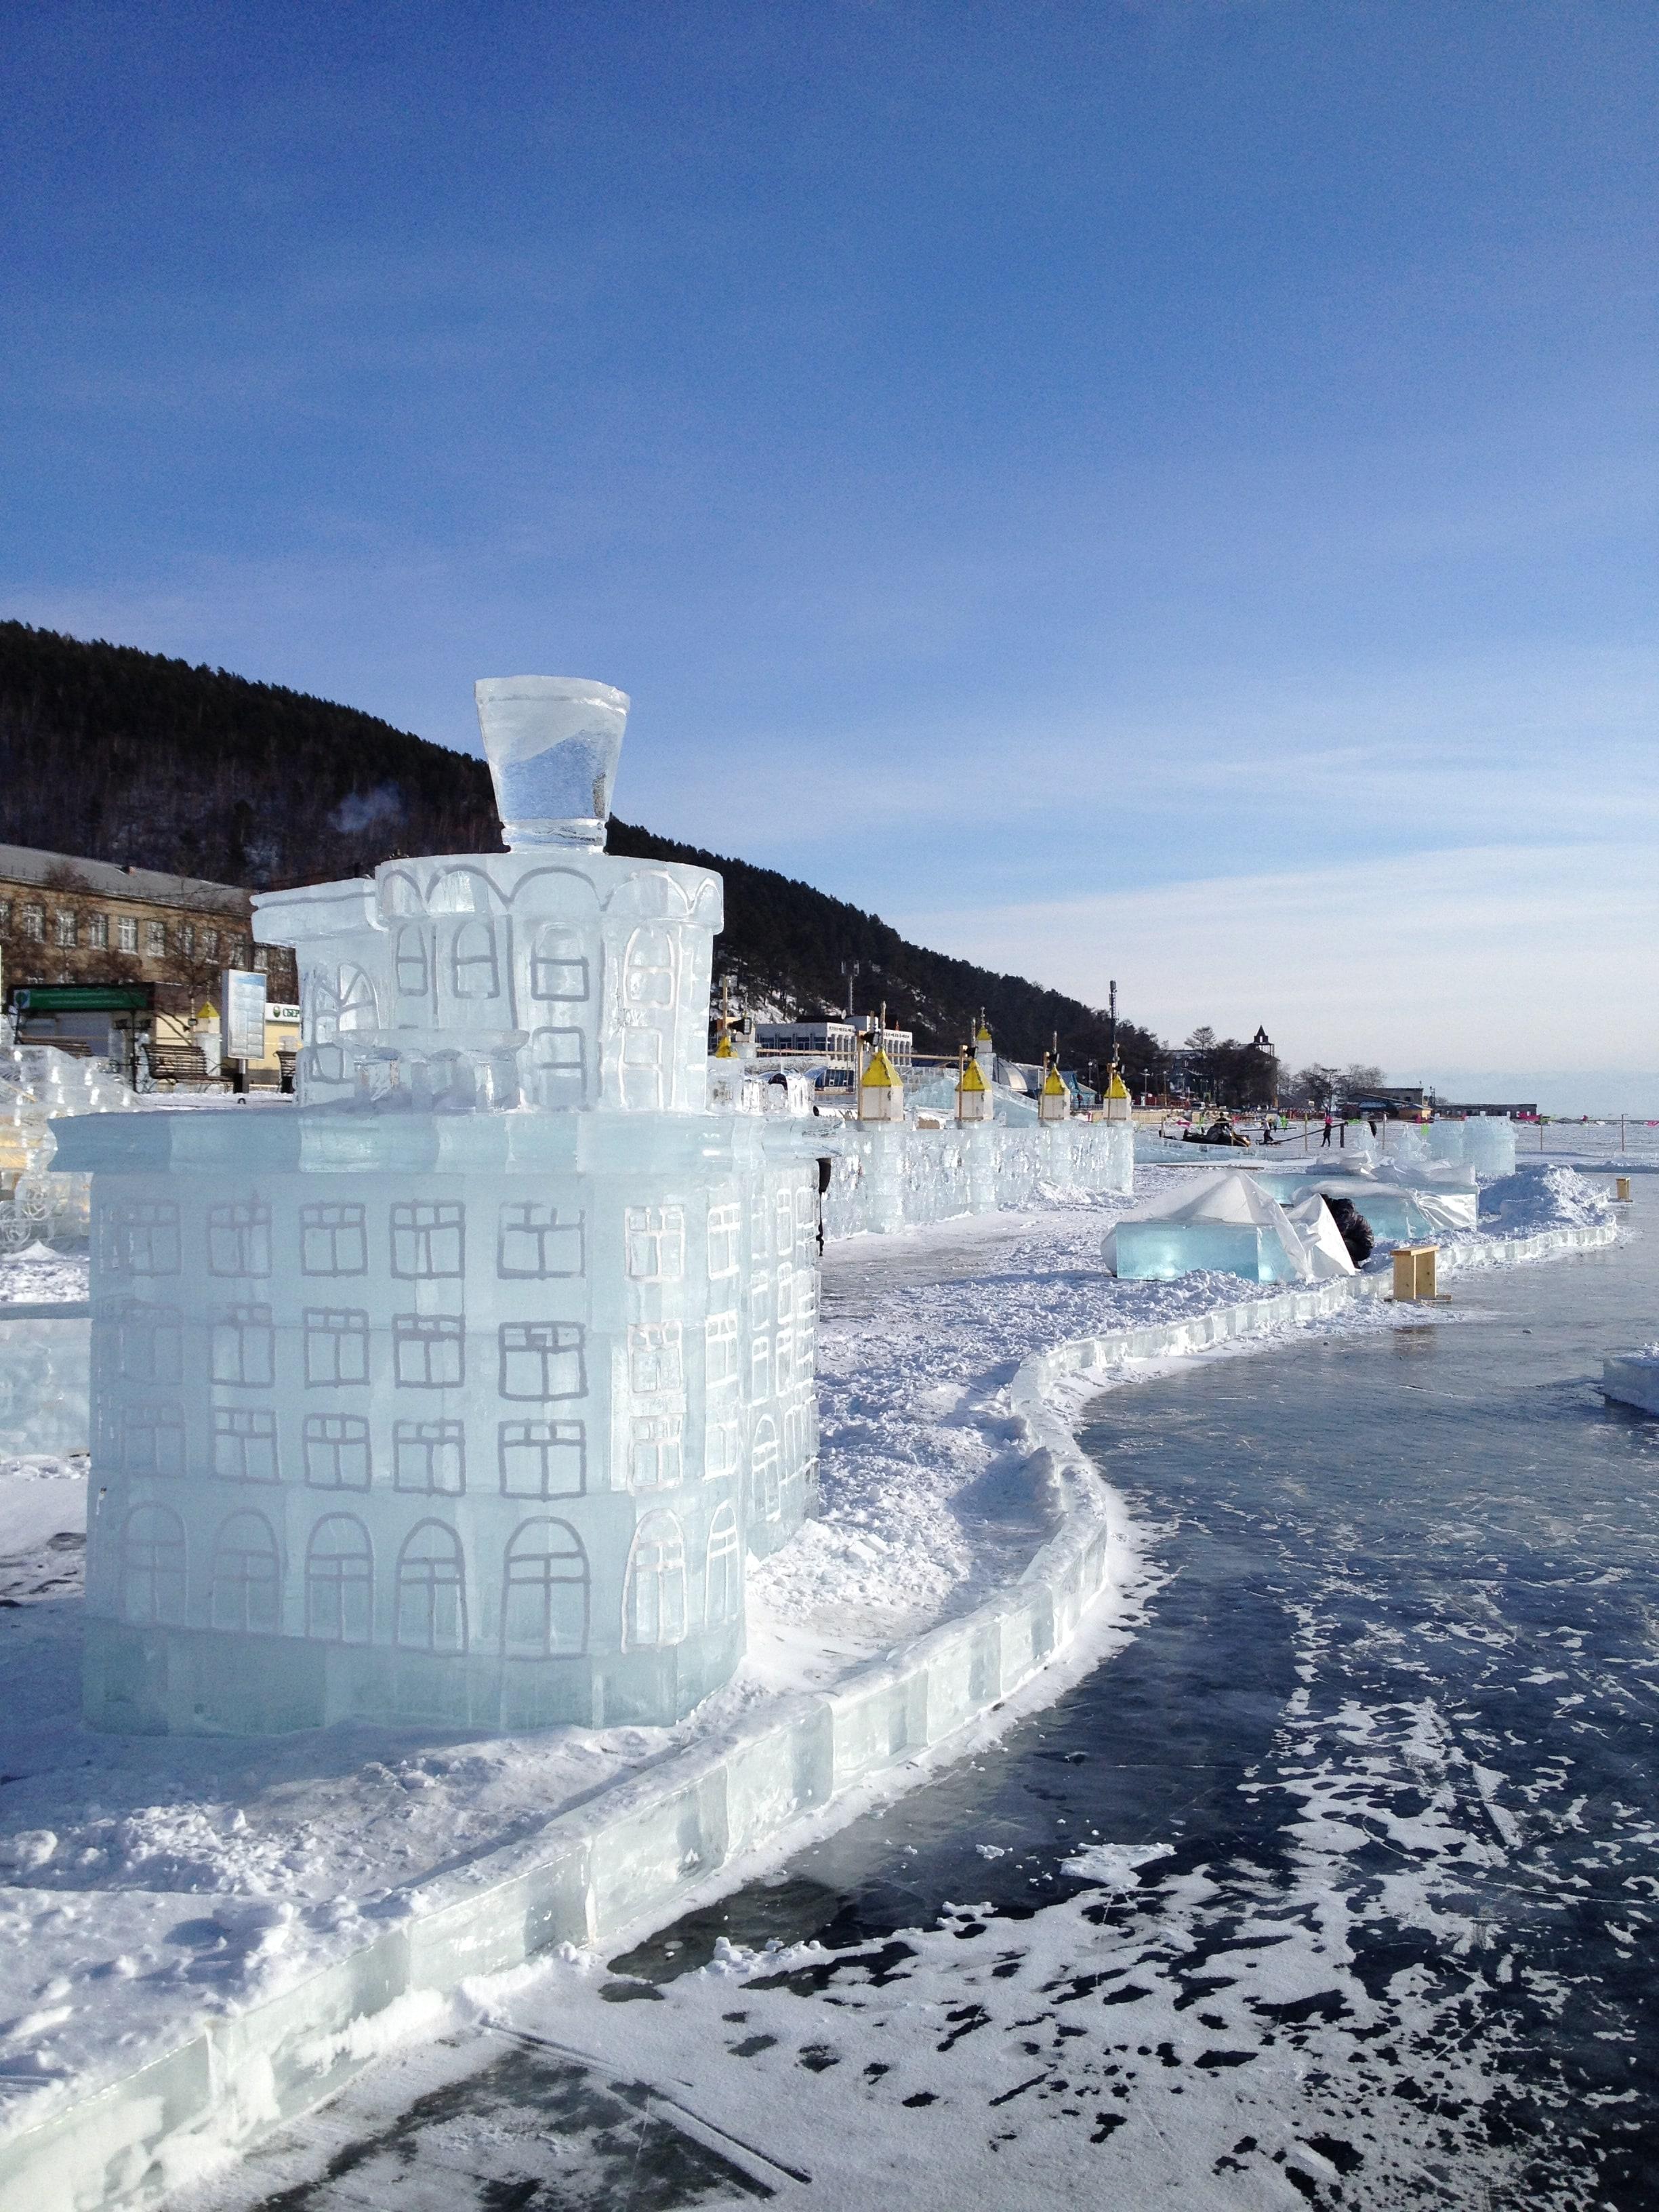 Ледяные скульптуры. Отдых на Байкале зимой